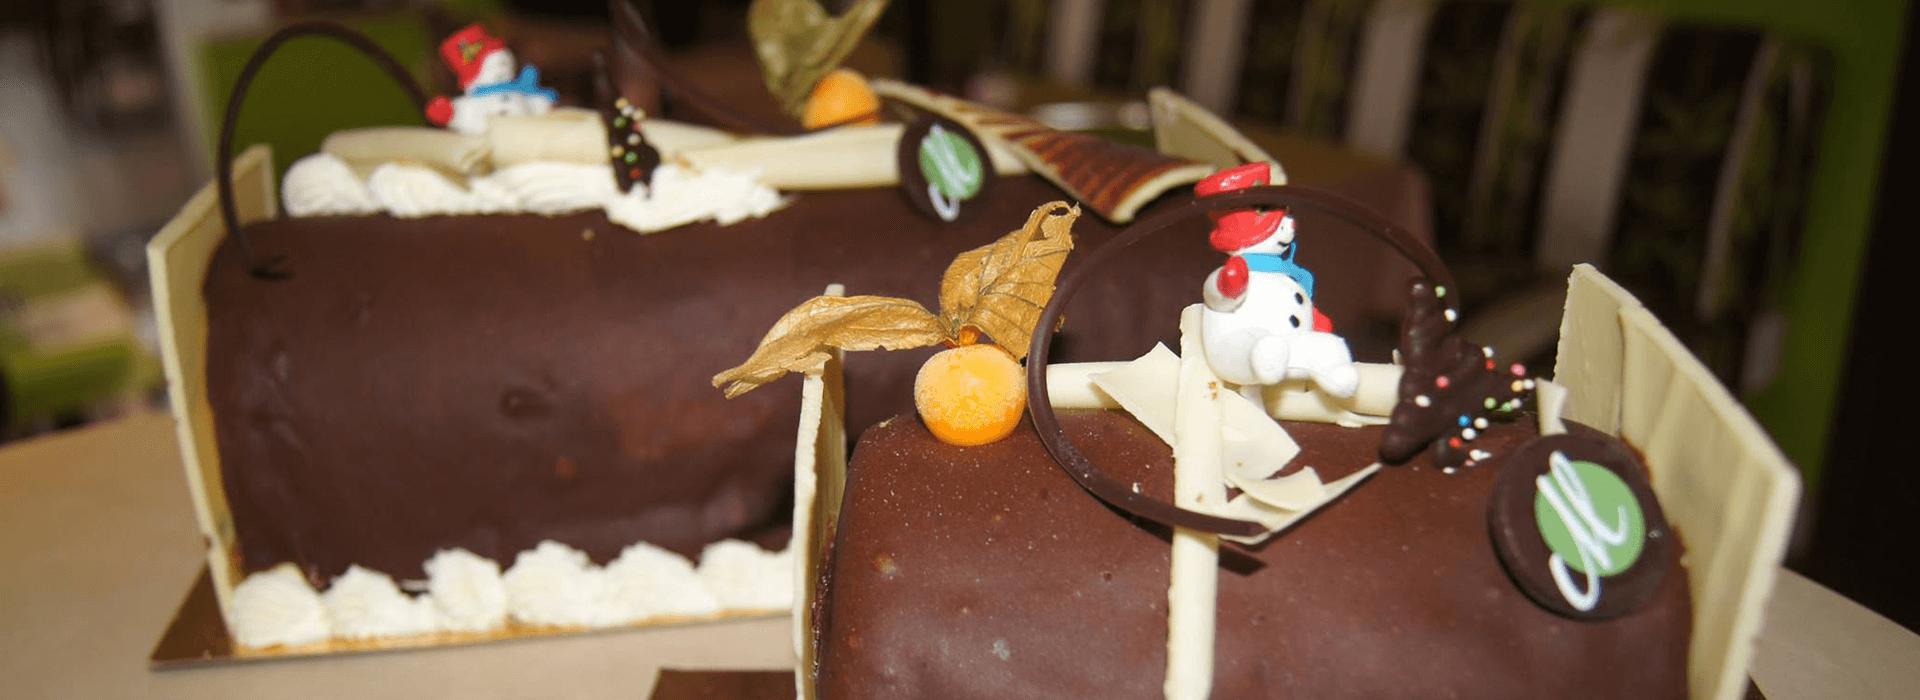 slider03-boulangerielouveigne